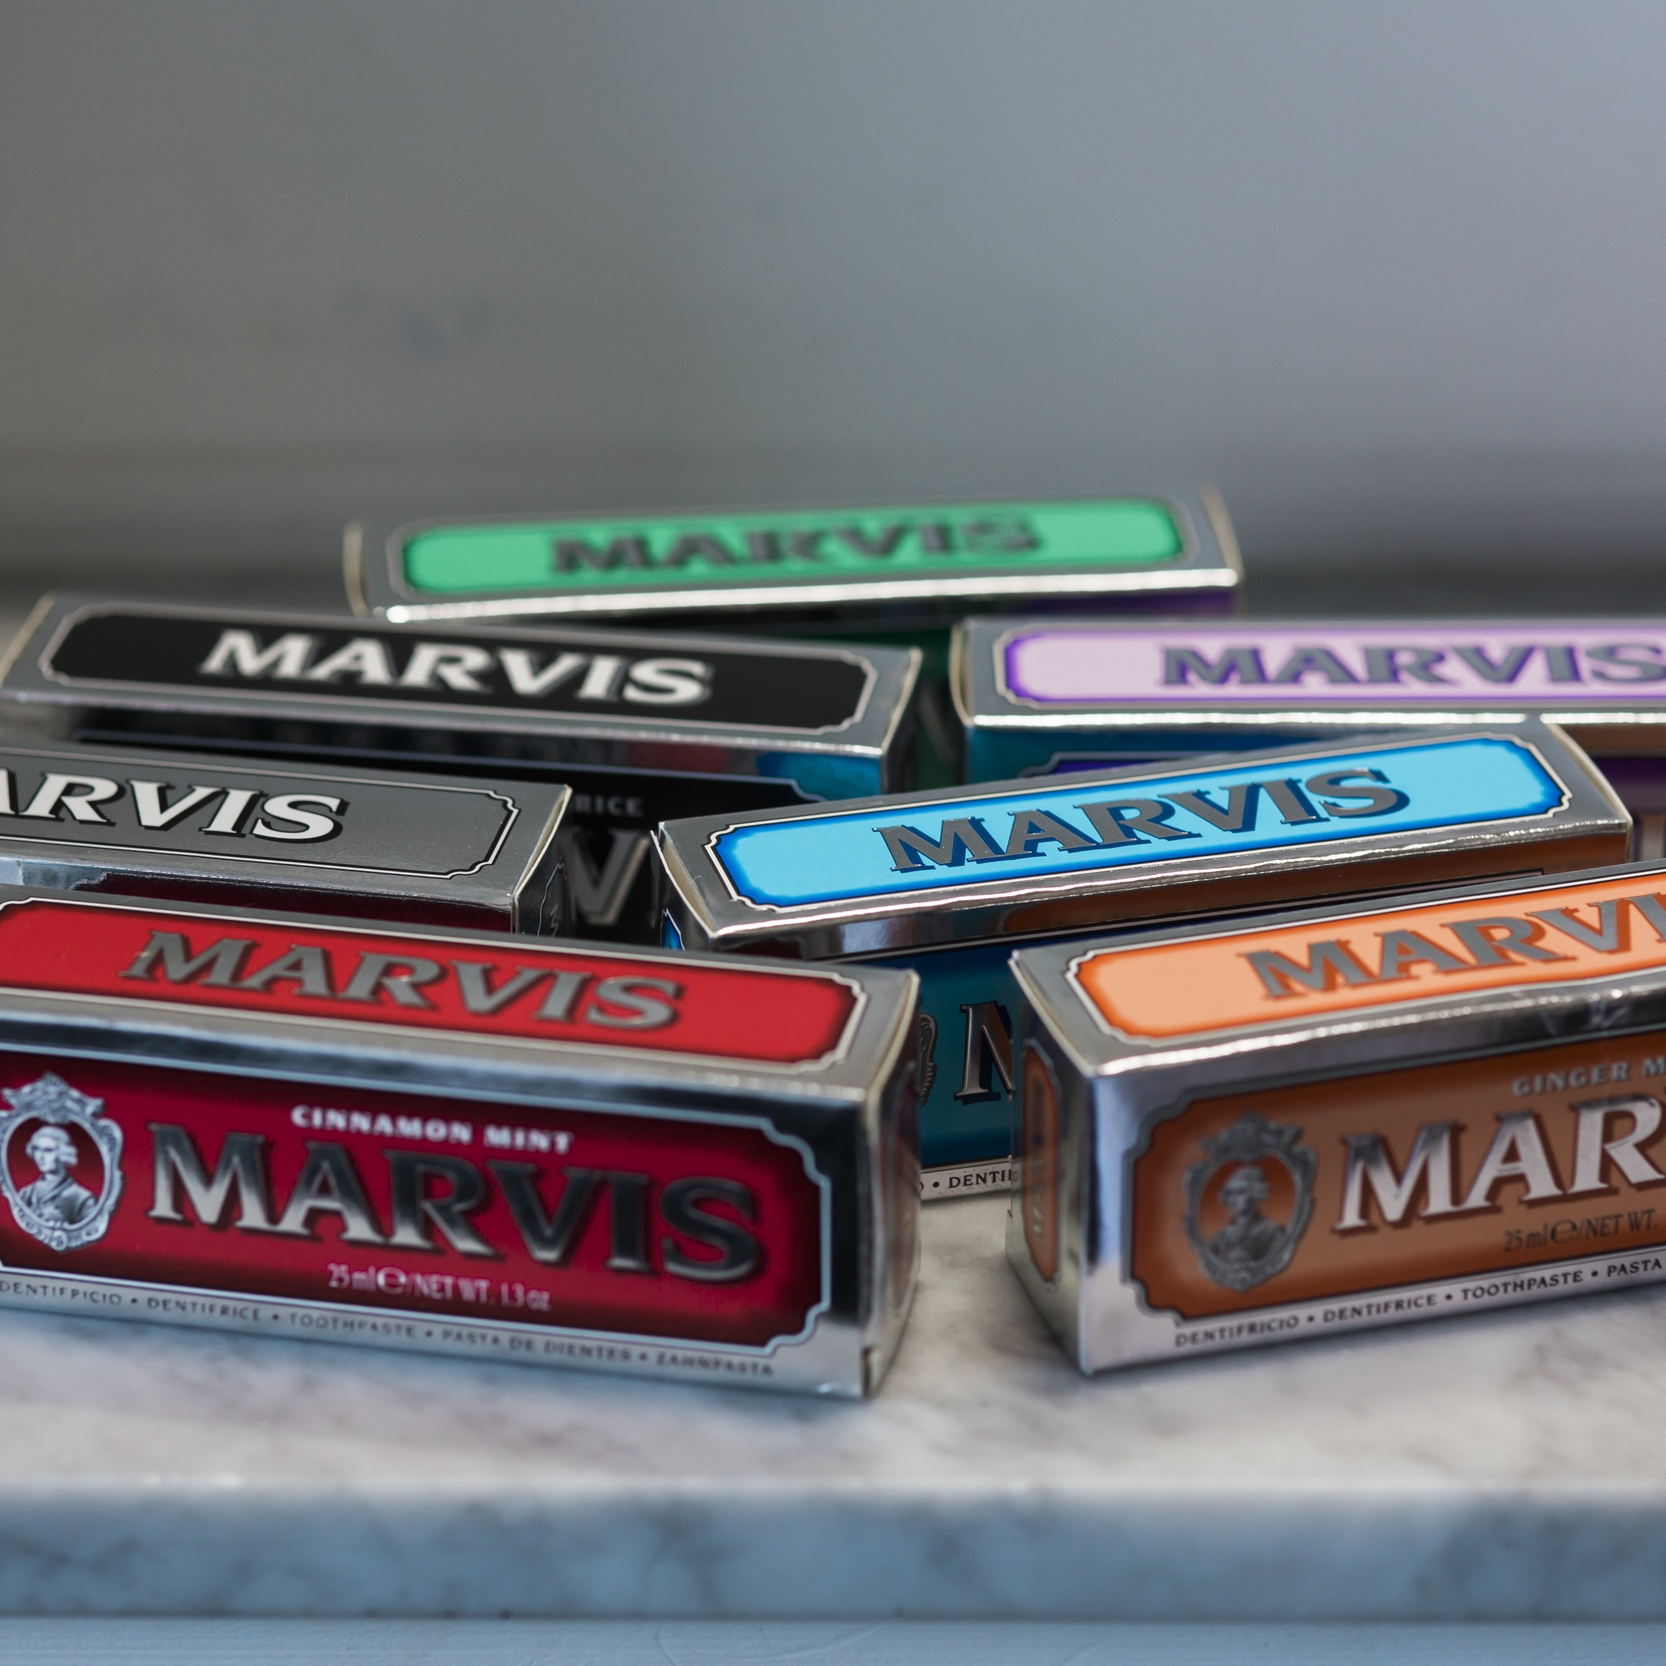 MArvis .jpg